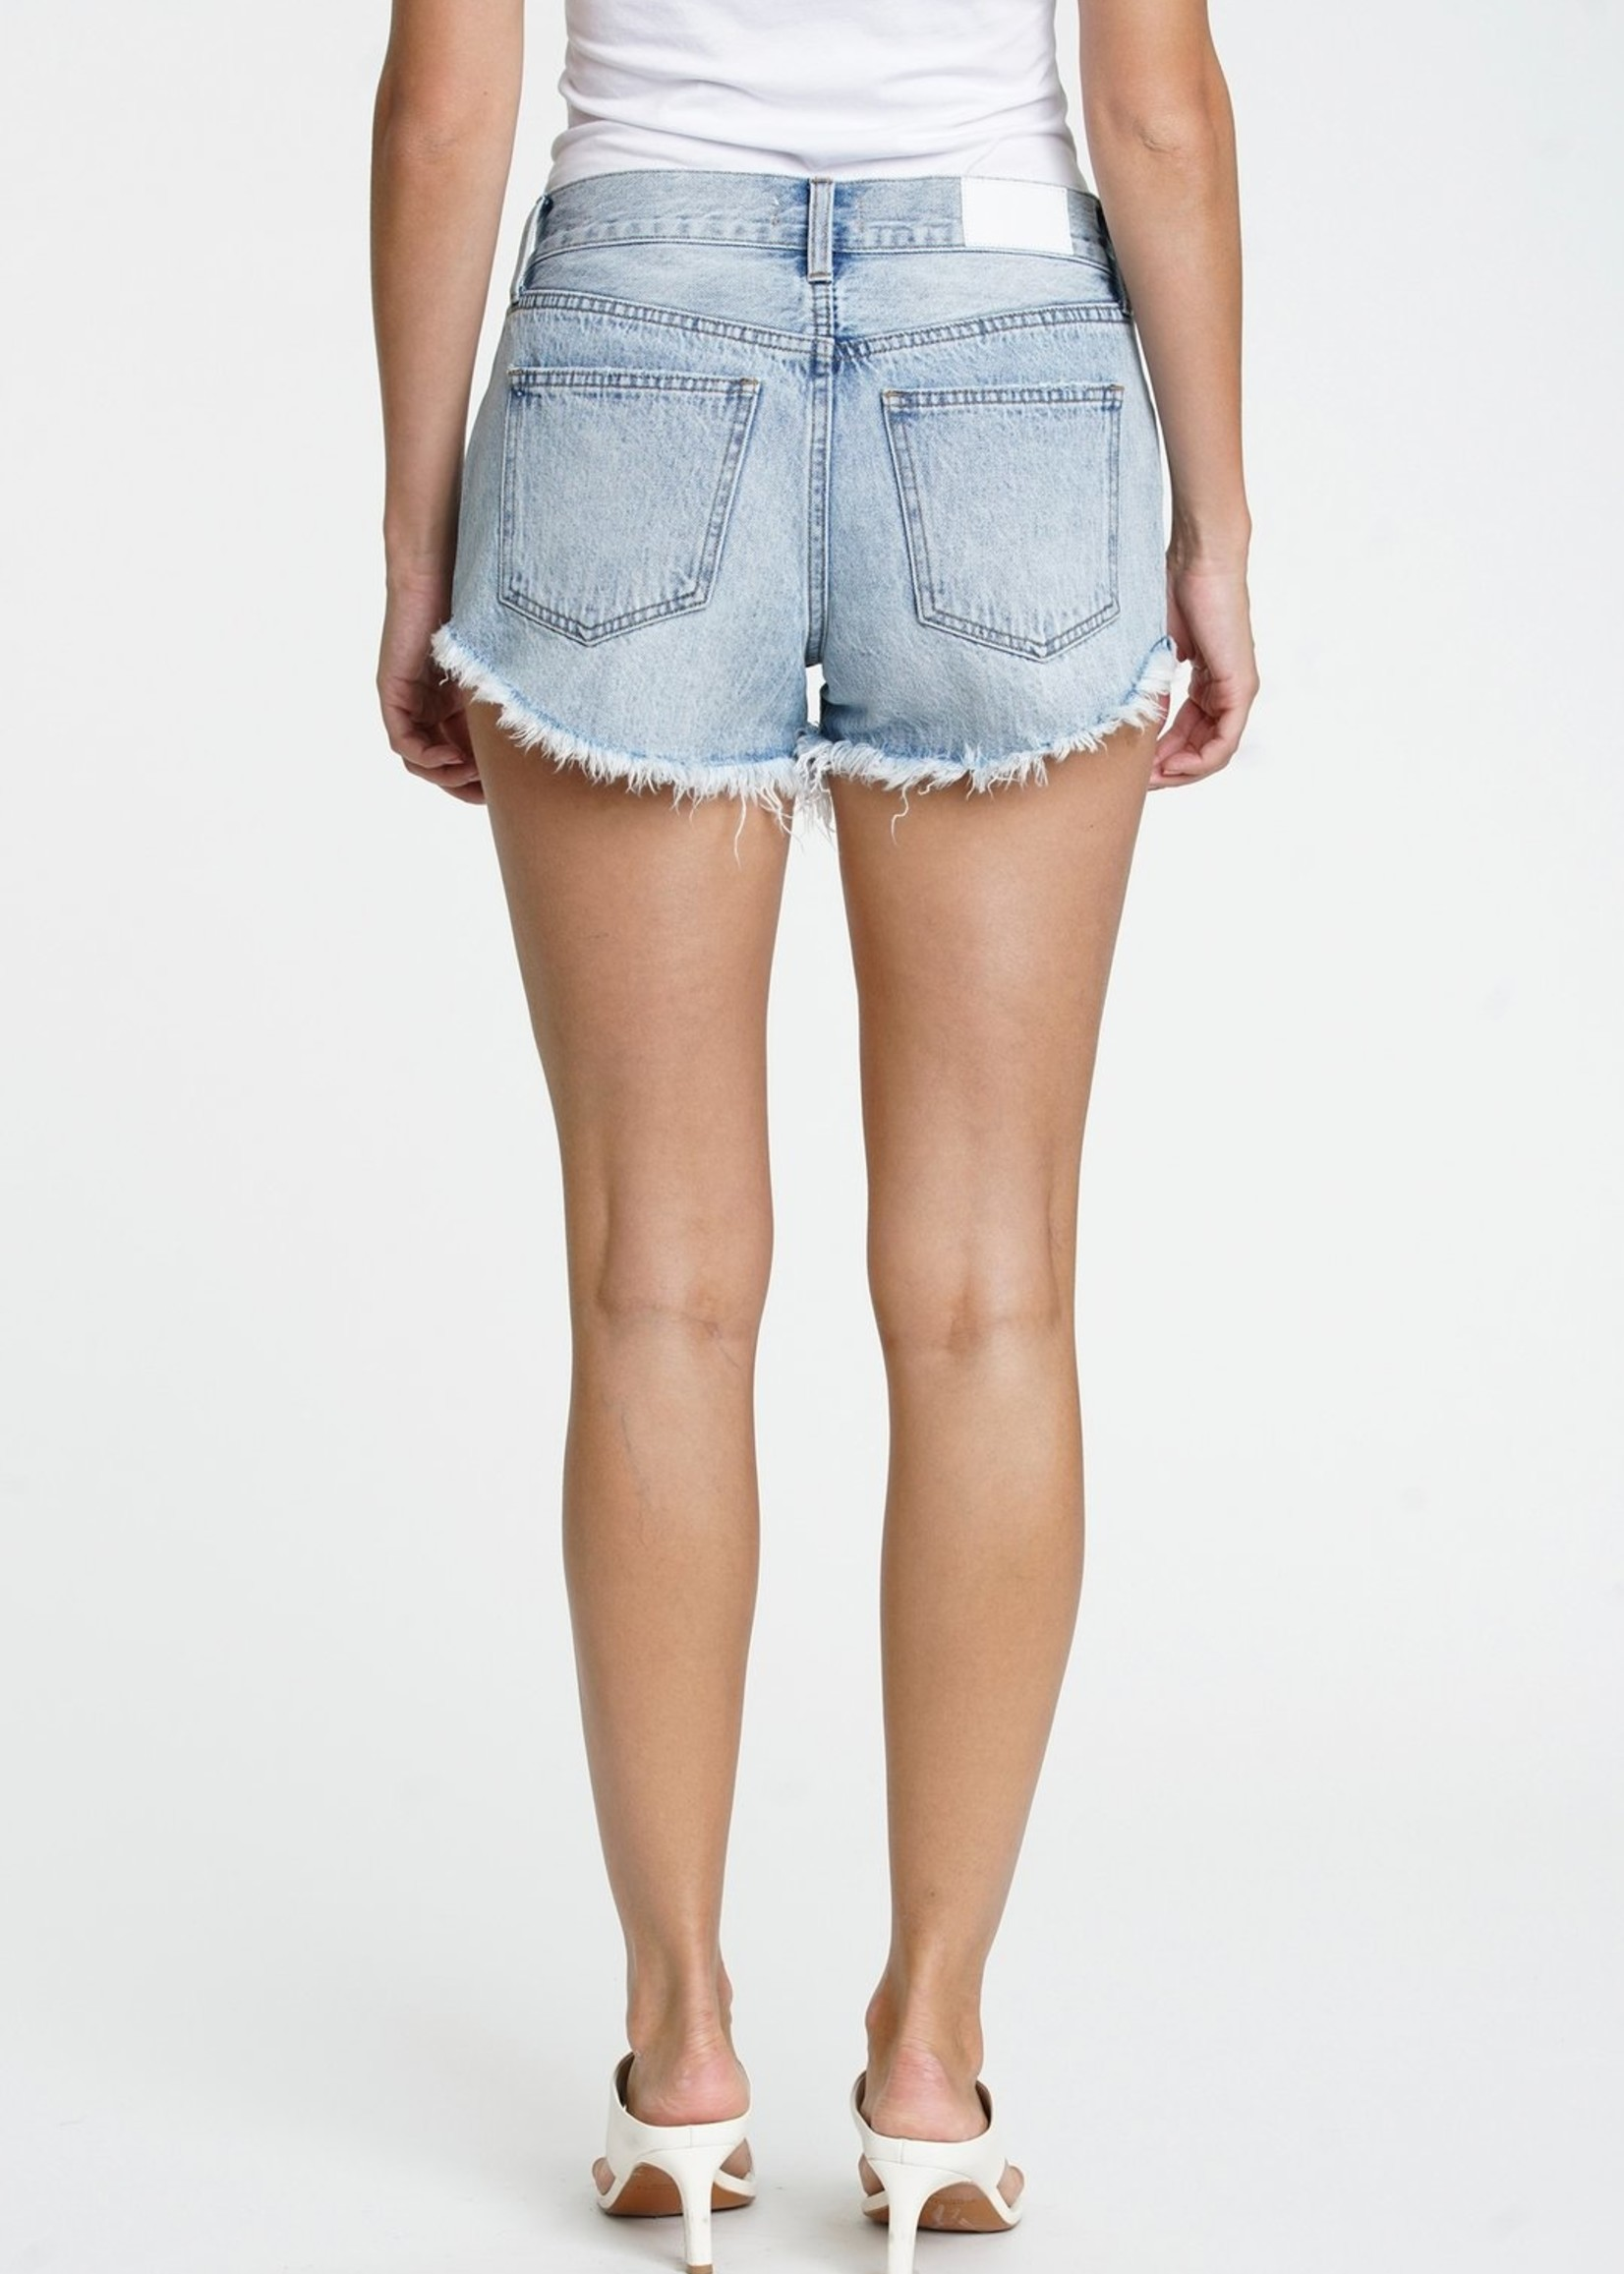 Gigi low rise cut off shorts